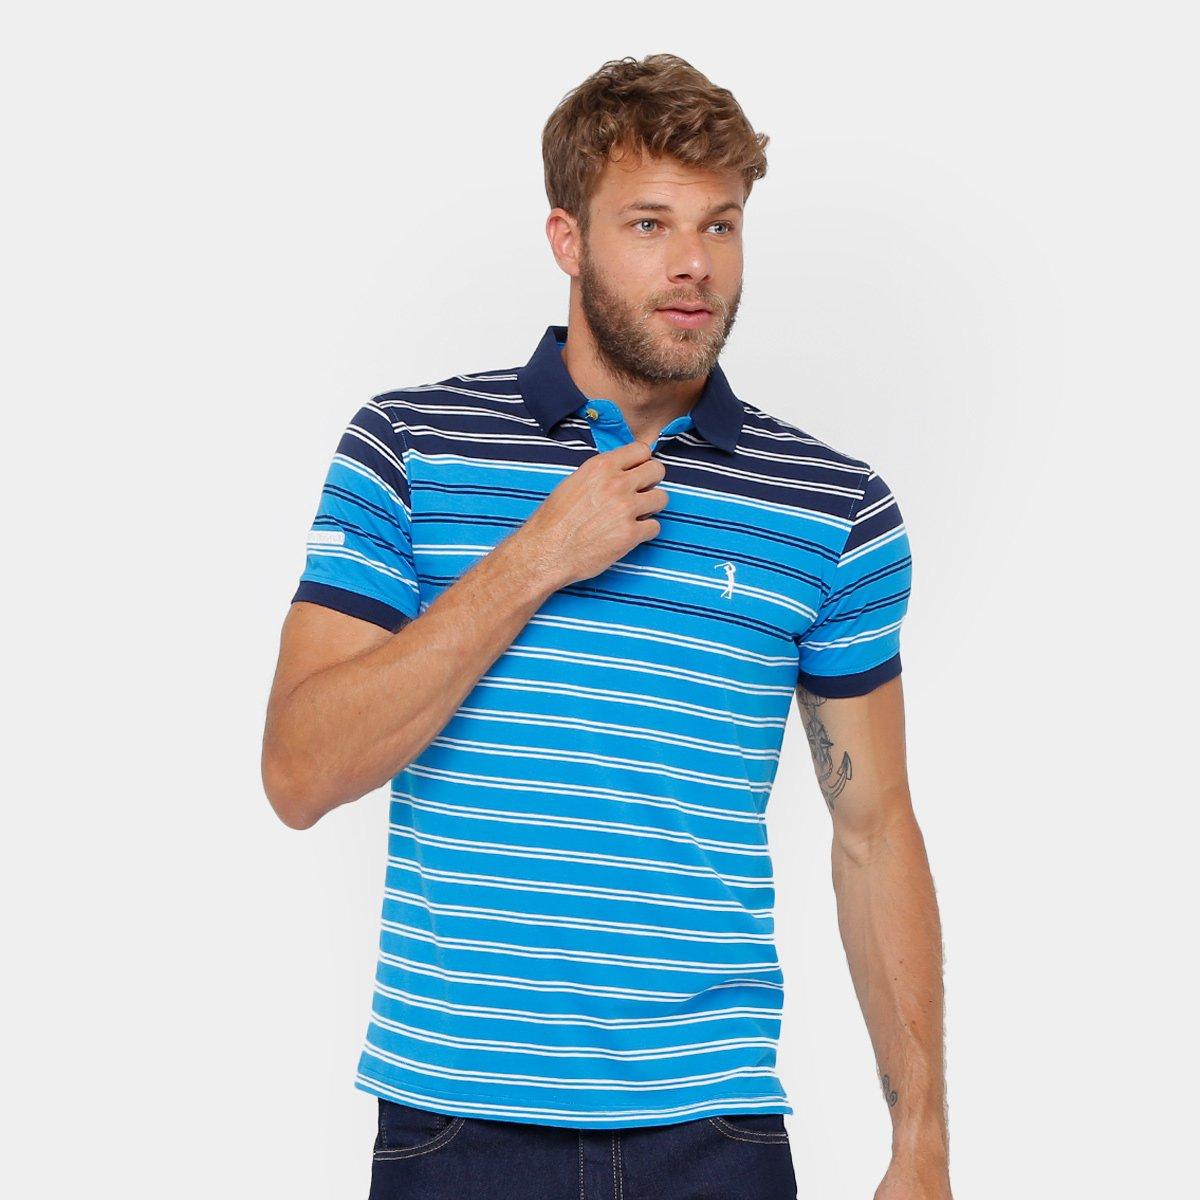 Camisa Polo Aleatory Malha Listrada Masculina - Compre Agora  dec2127d4f2e2